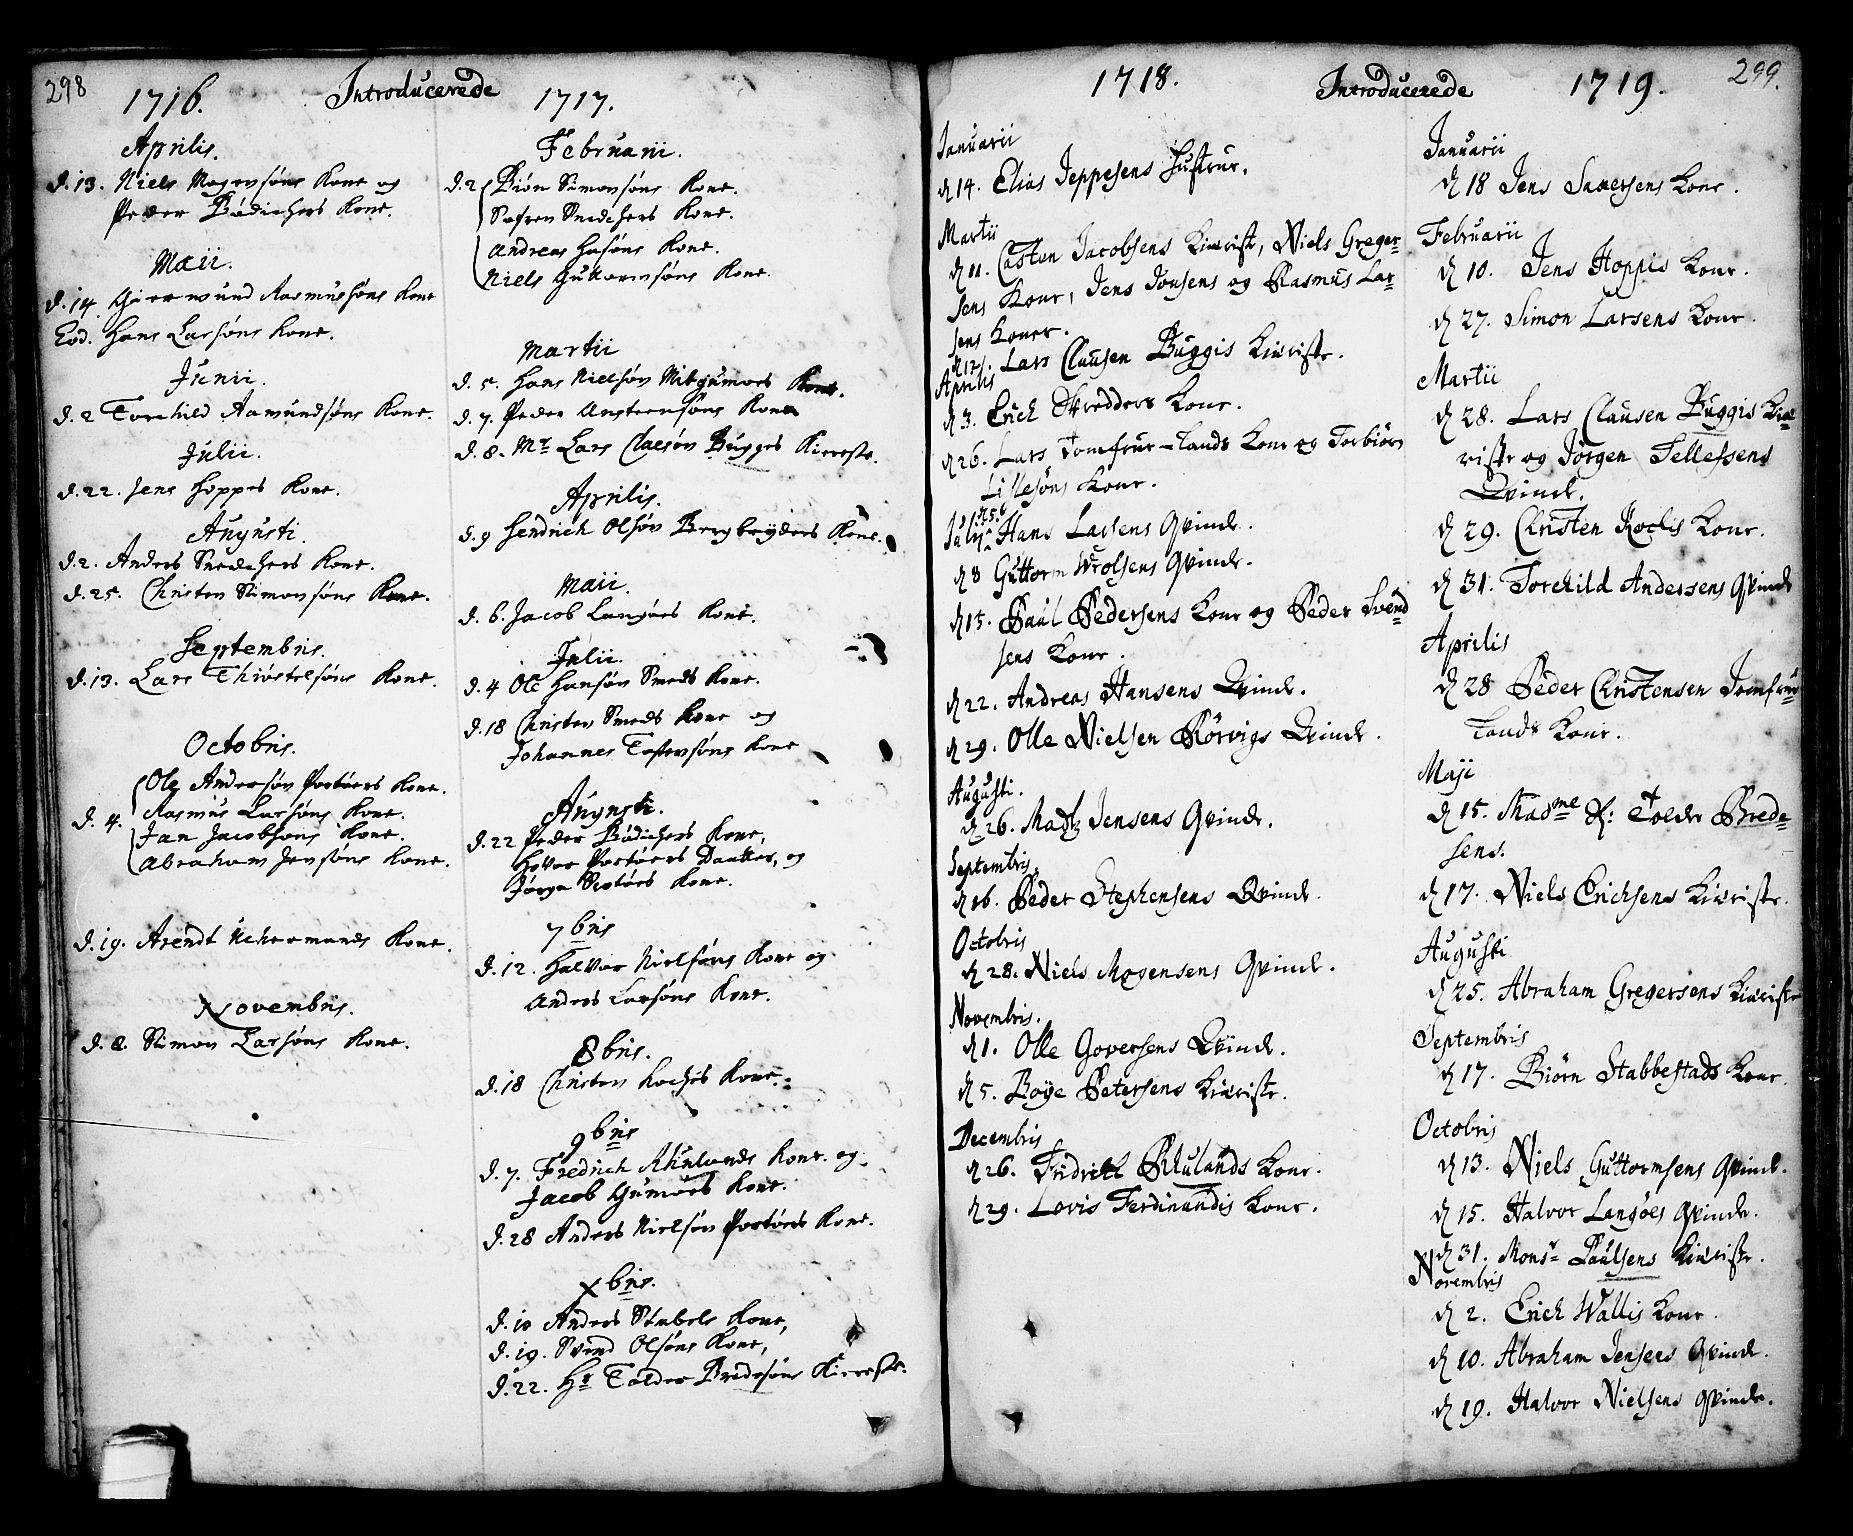 SAKO, Kragerø kirkebøker, F/Fa/L0001: Ministerialbok nr. 1, 1702-1766, s. 298-299